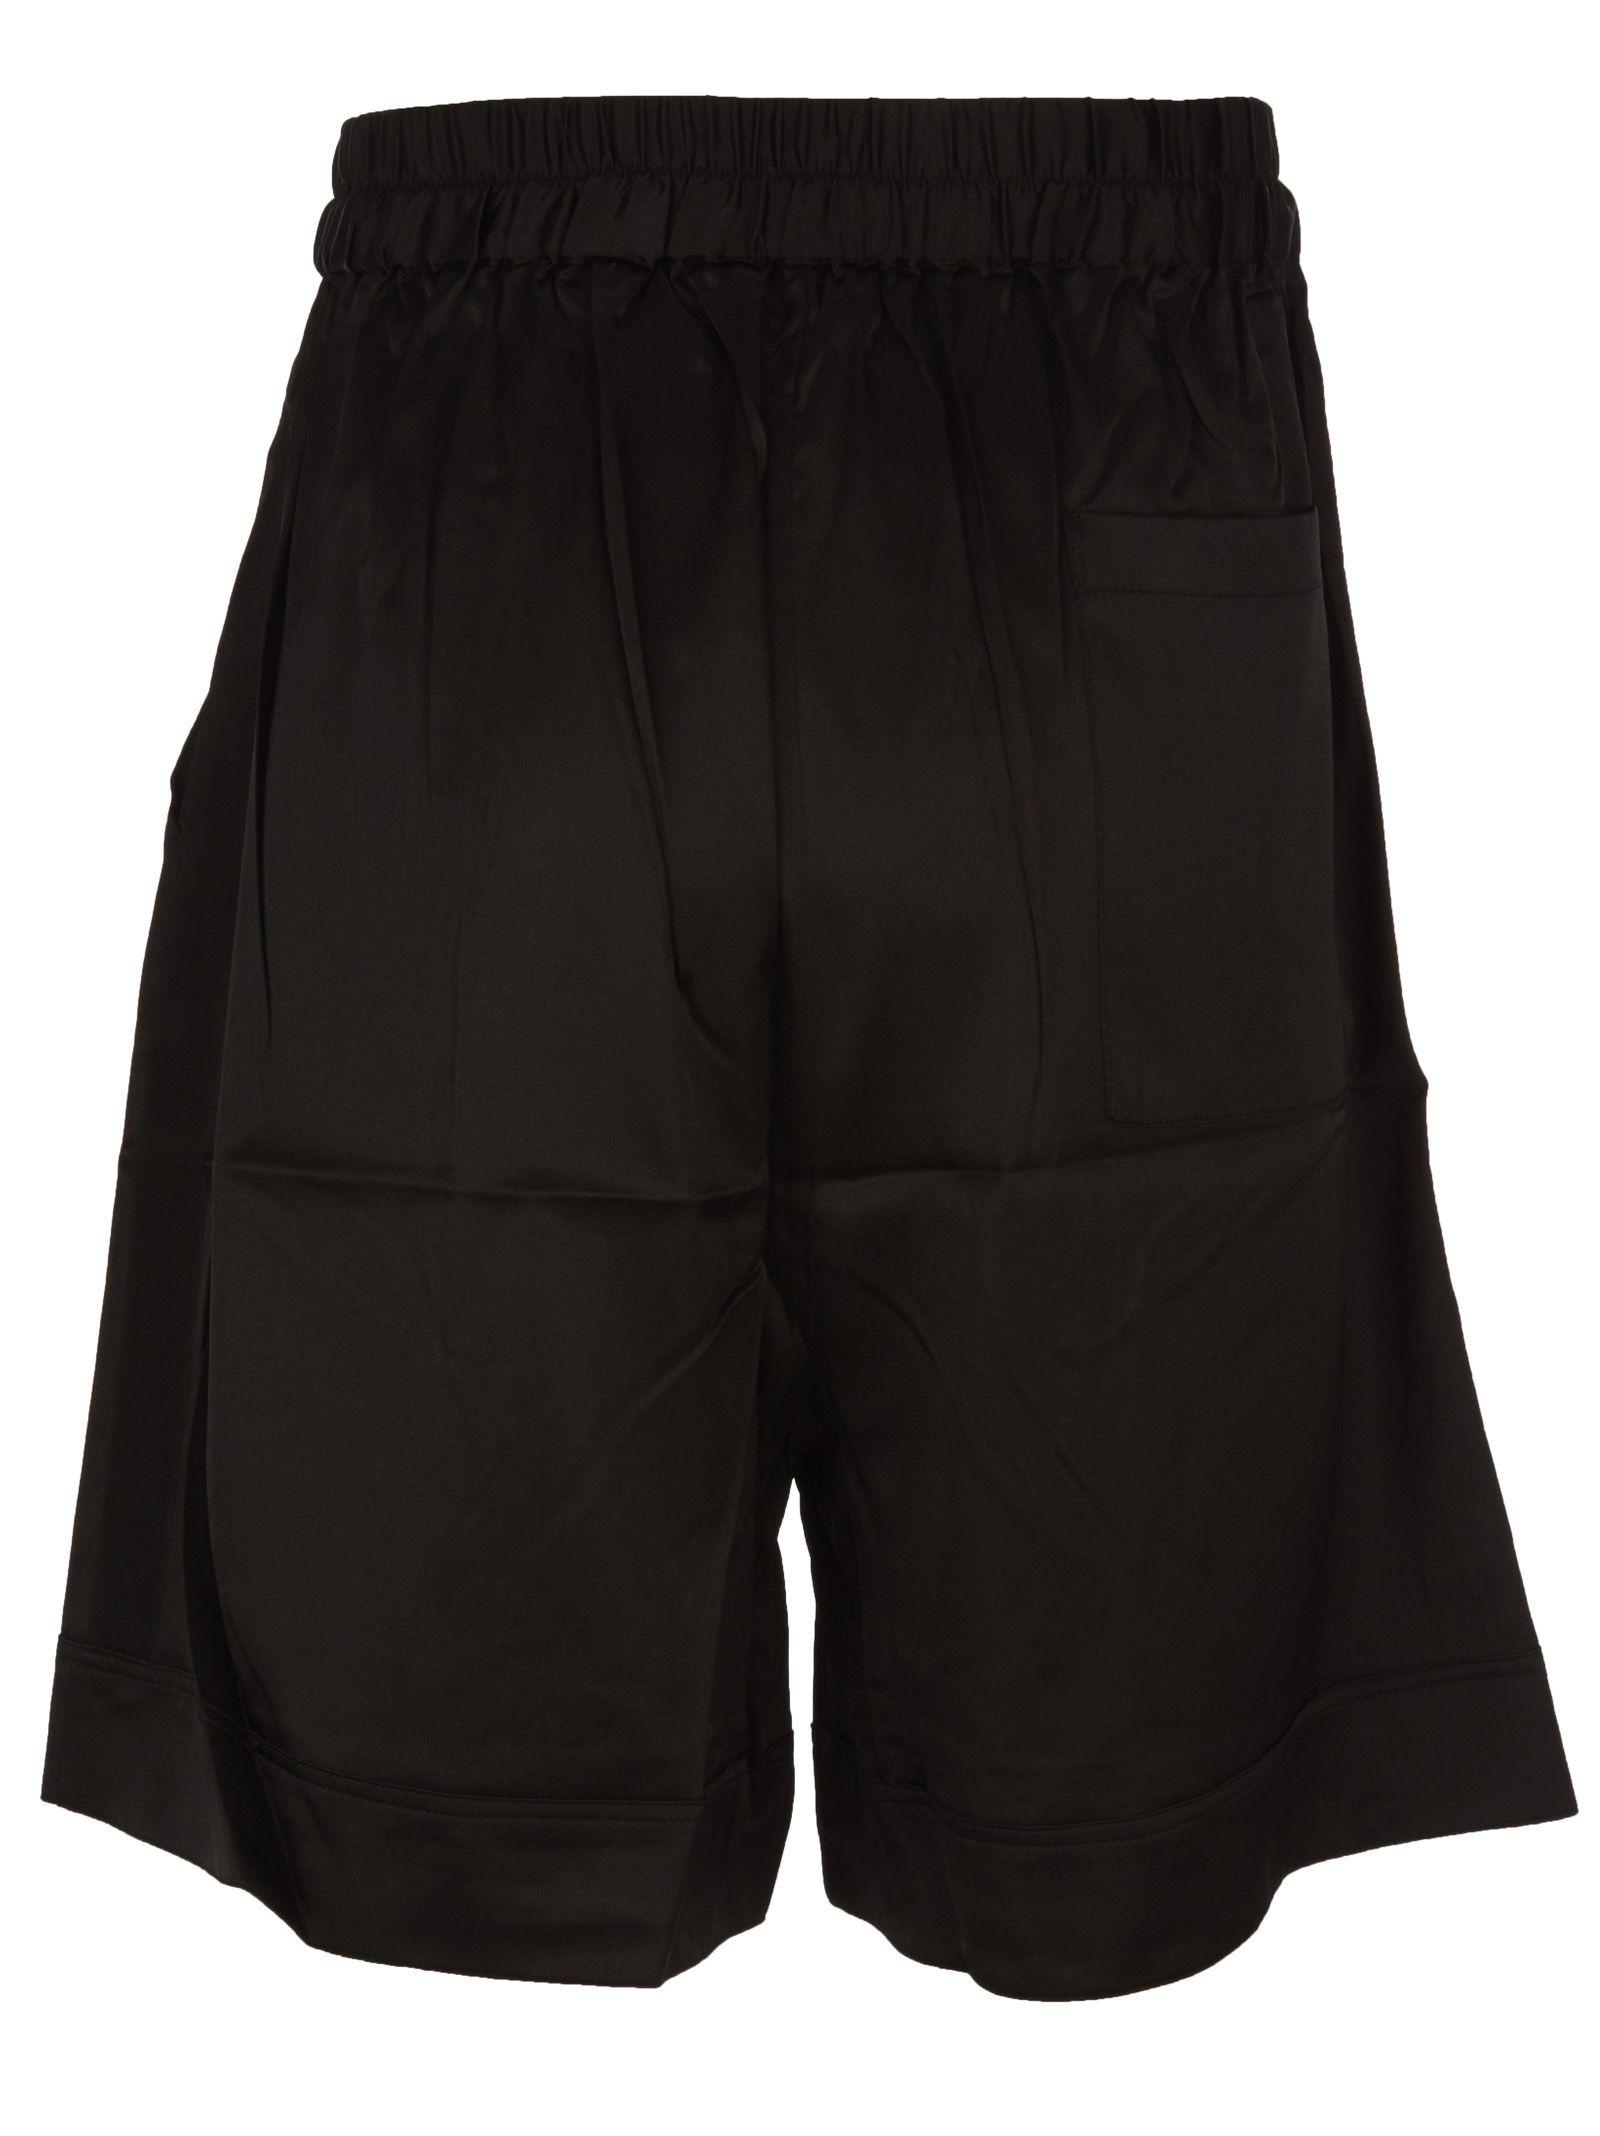 52cc7a9f02f LANEUS SHORTS. #laneus #cloth | Laneus in 2019 | Shorts, Mens ...